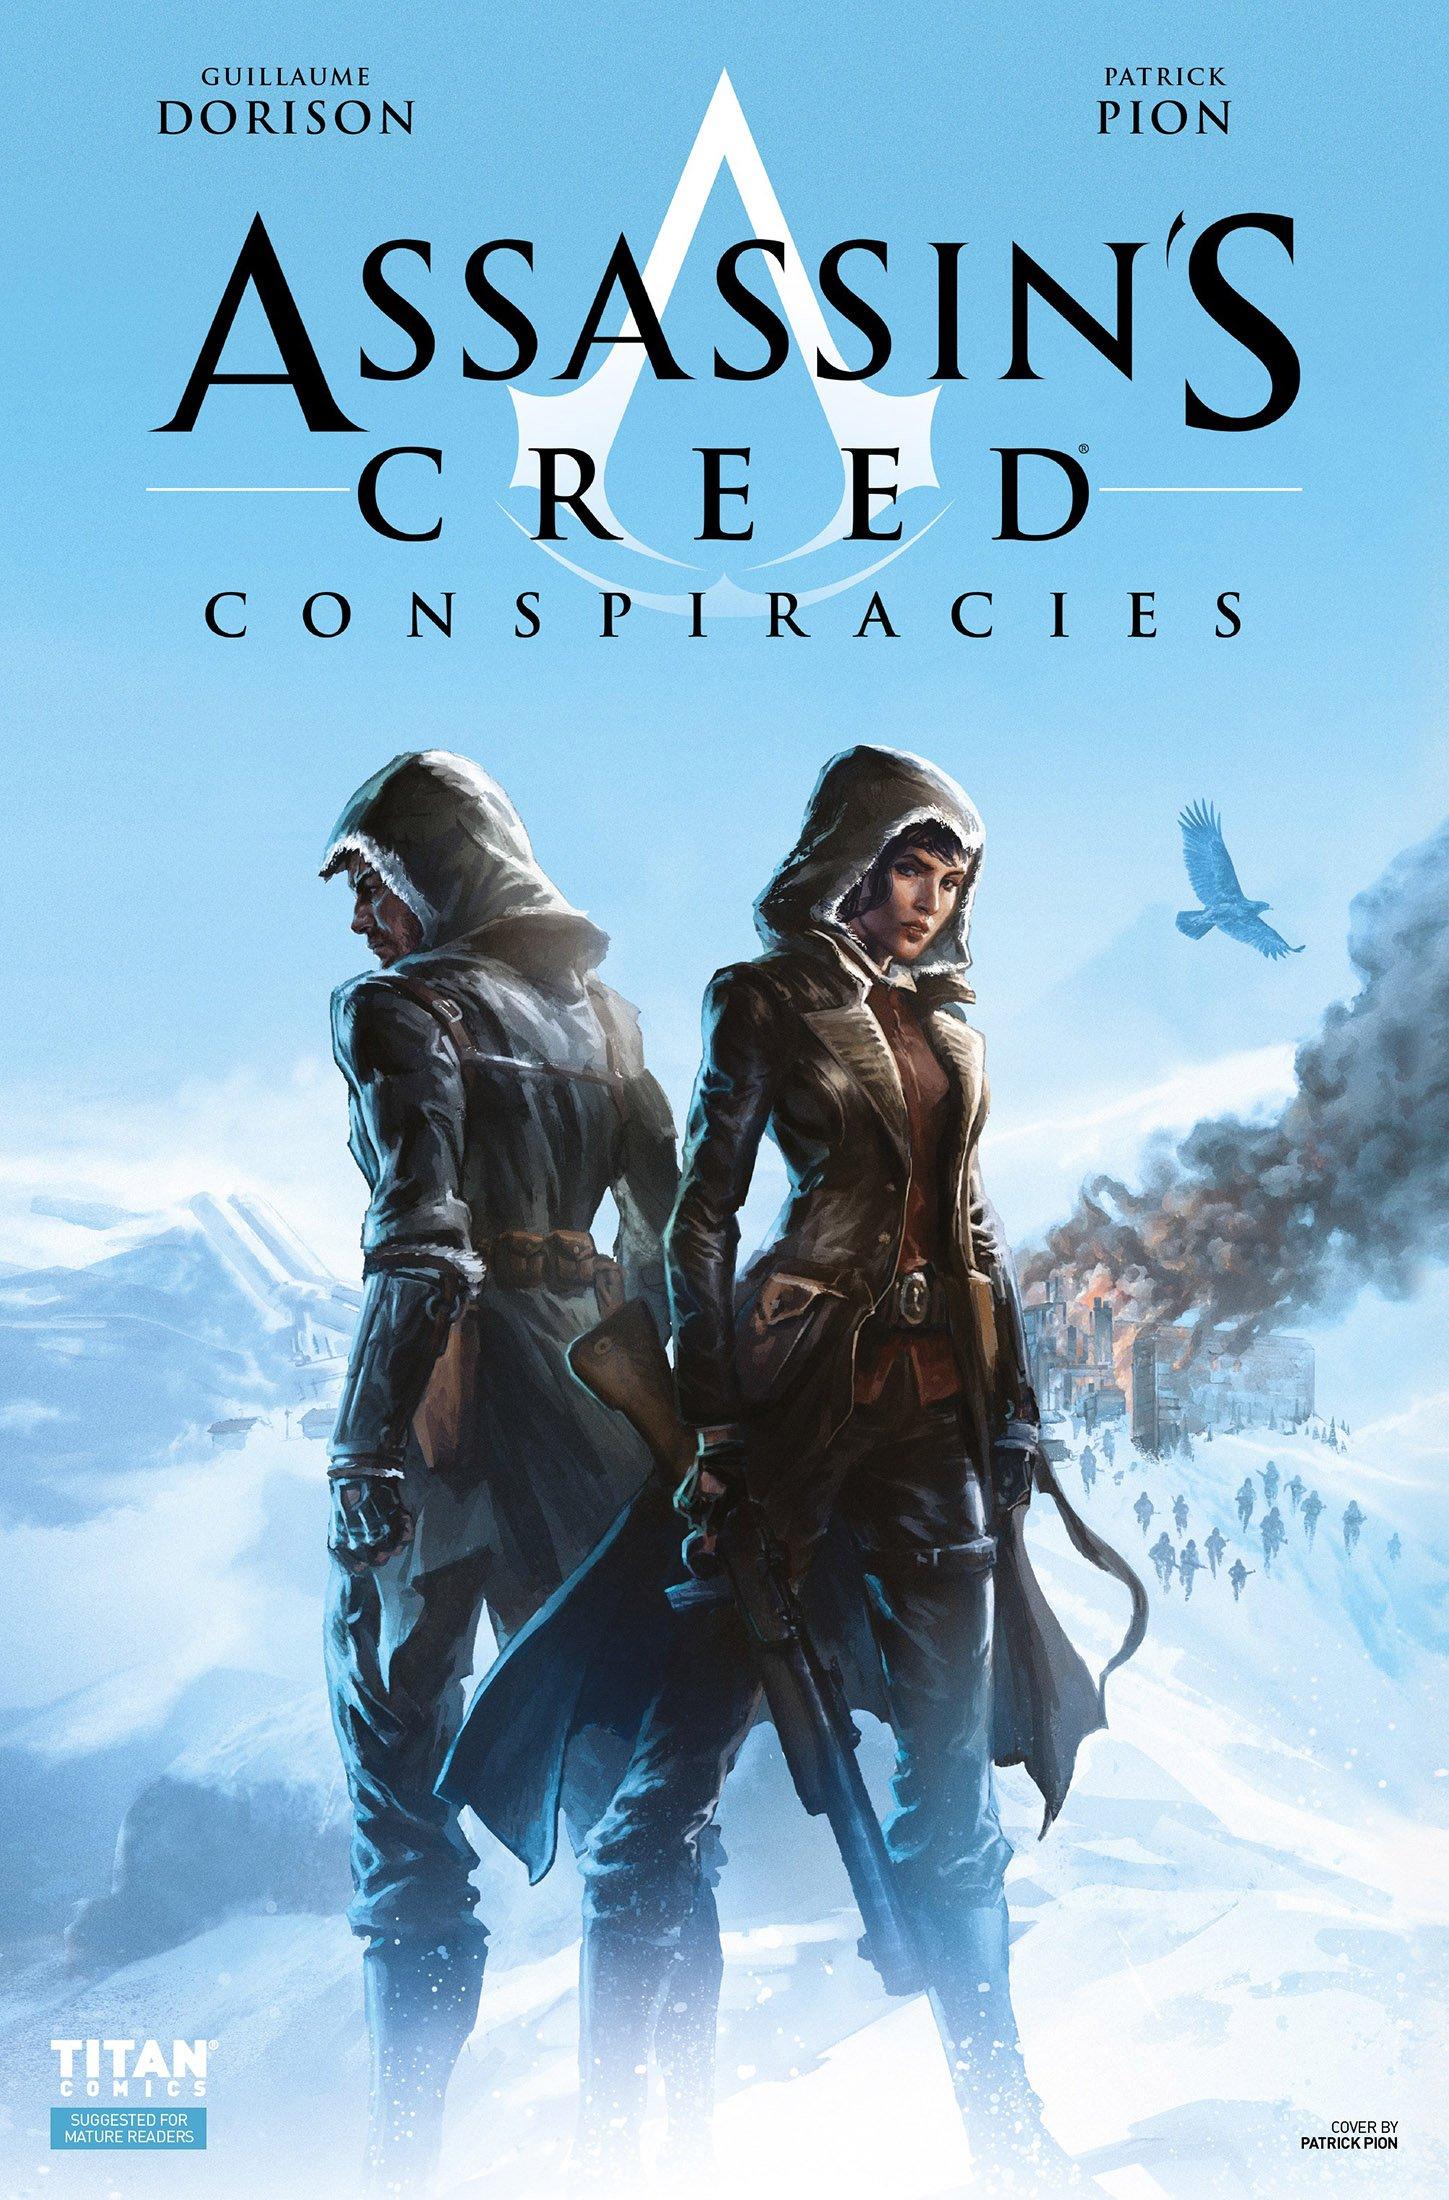 Assassin's Creed - Conspiracies 02 (October 2018)